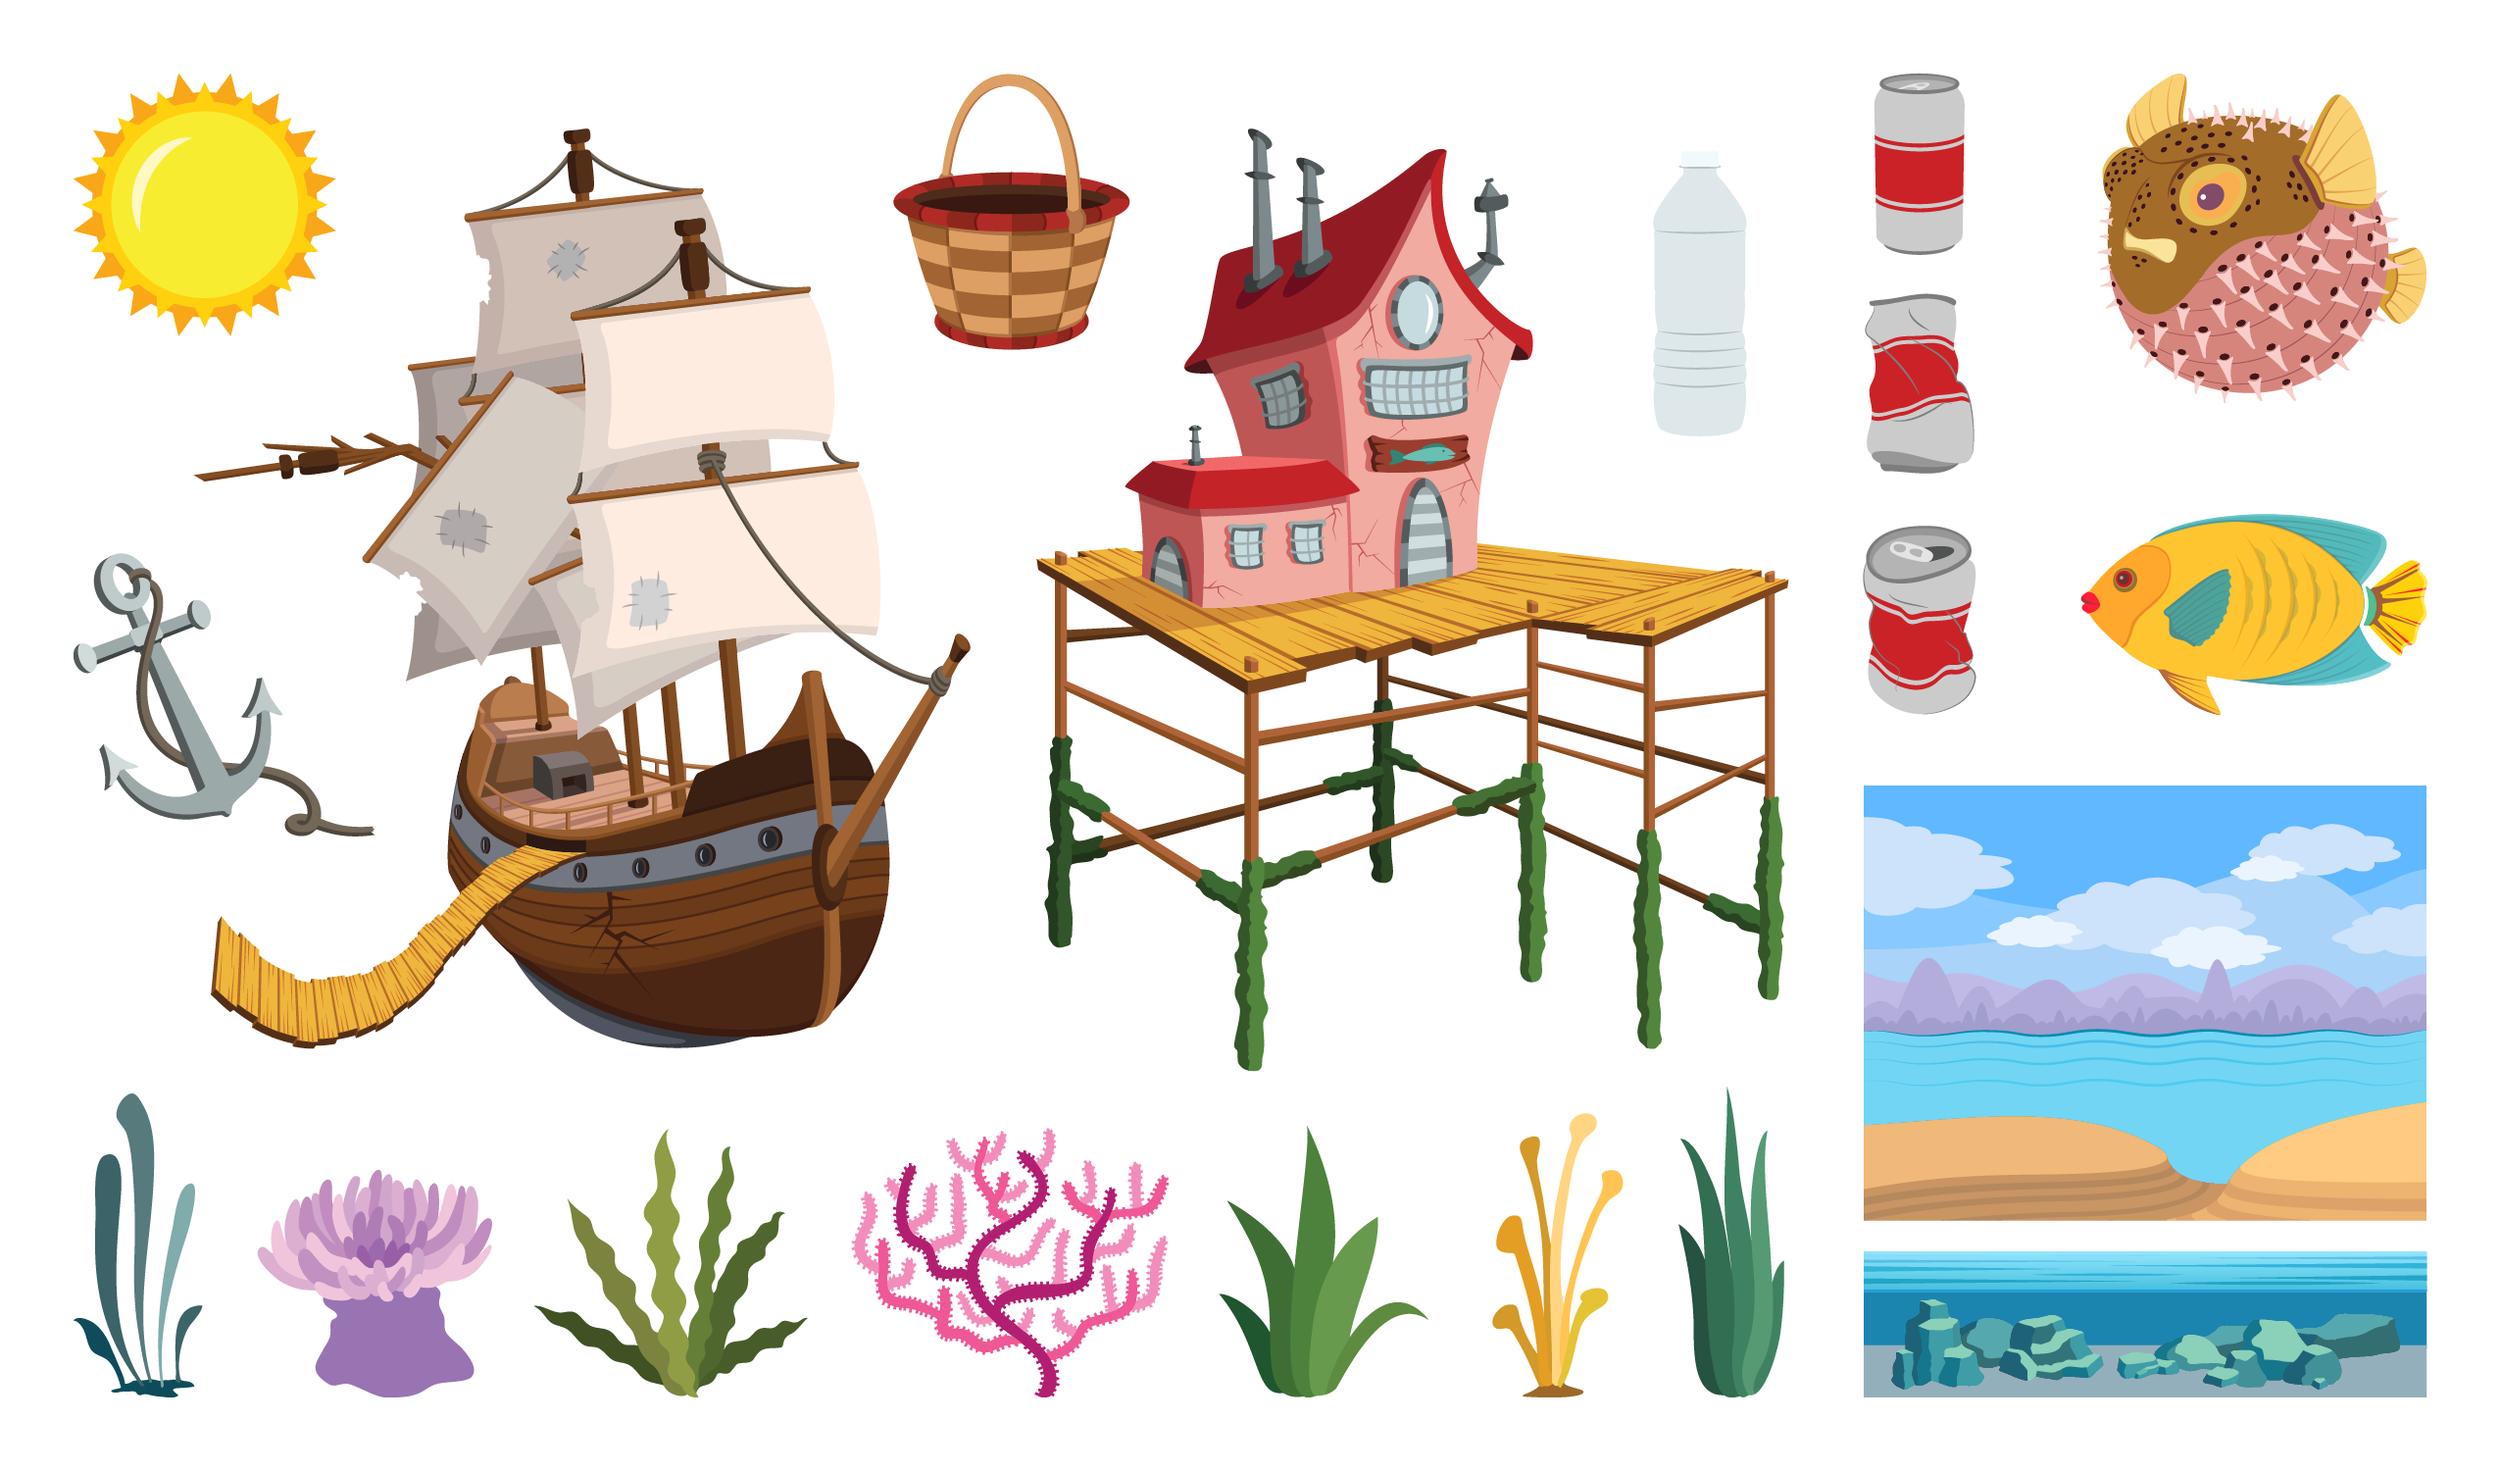 Island Adventure ; UI design for mobile game